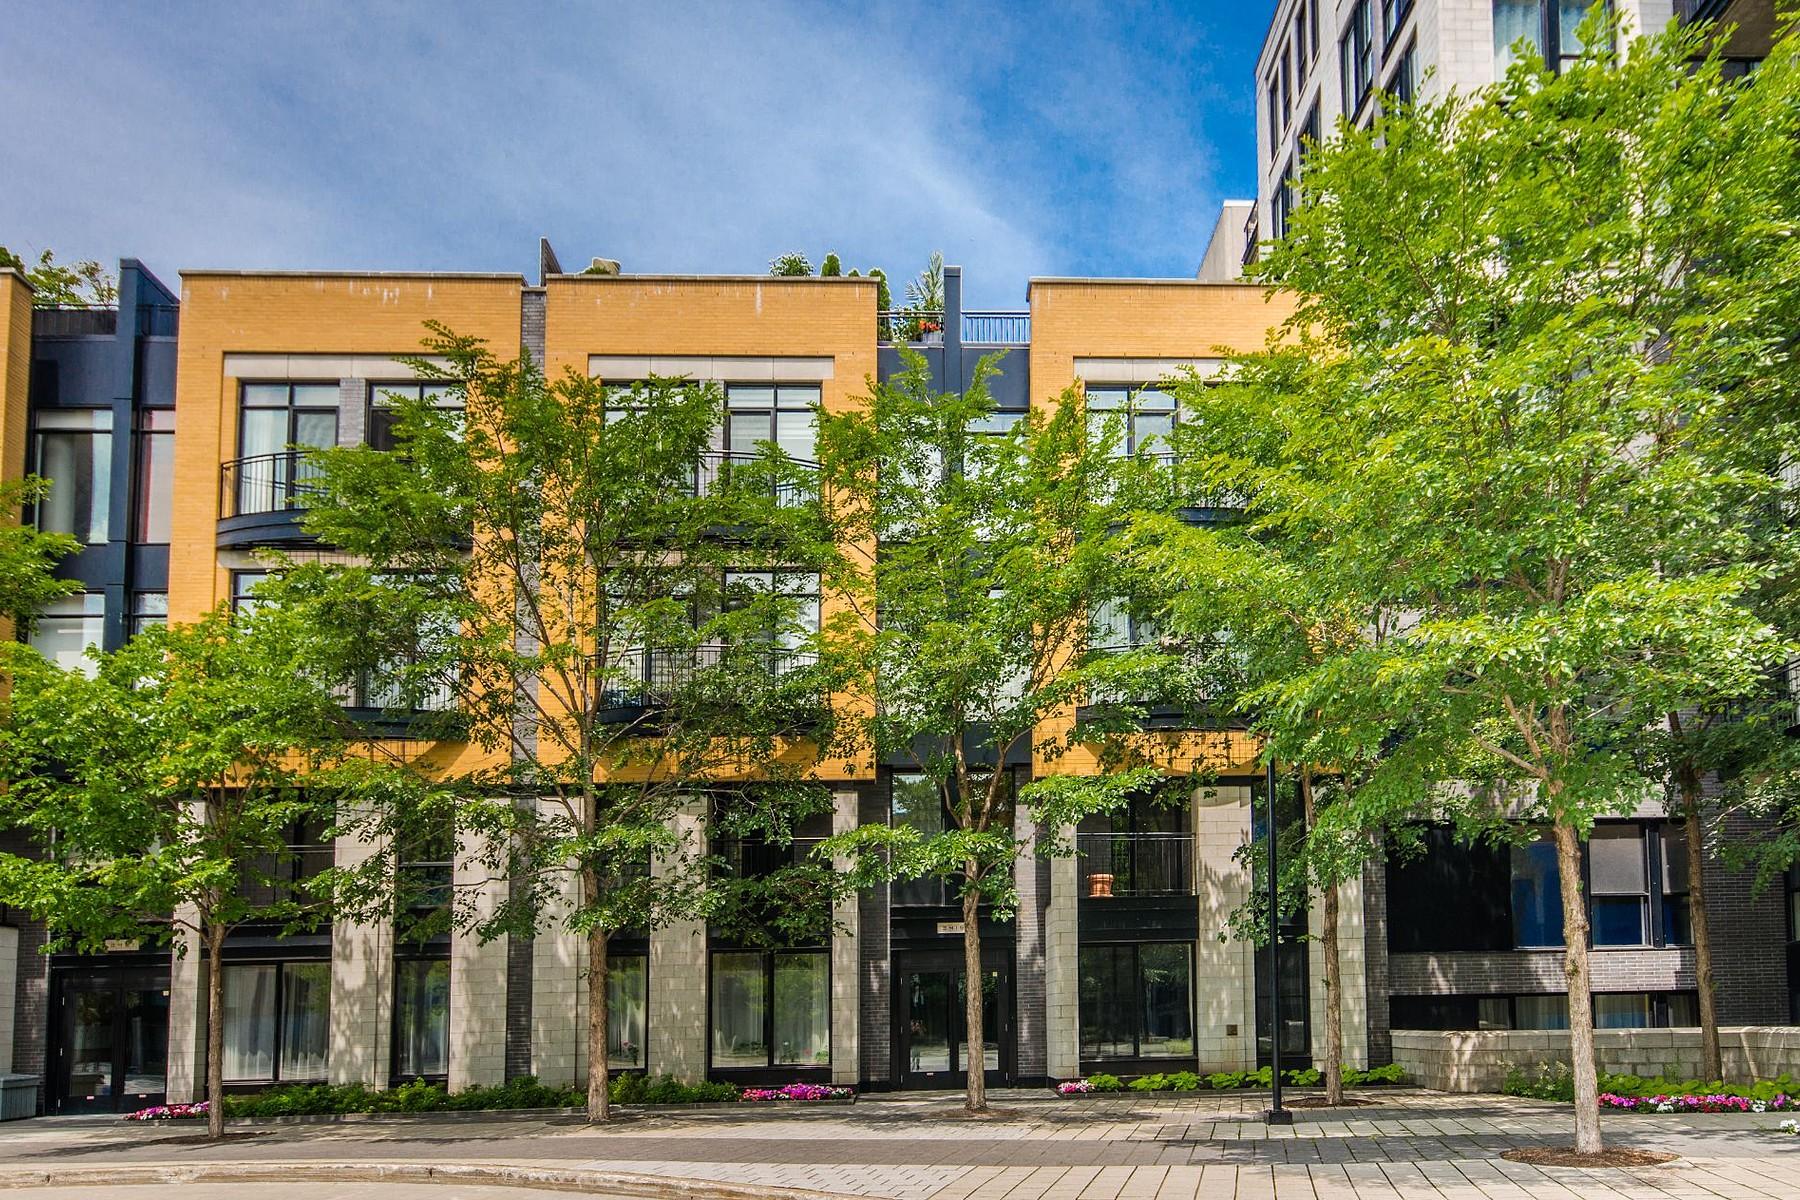 Nhà chung cư vì Bán tại Le Plateau-Mont-Royal (Montréal), Montréal 3419 Av. Henri-Julien, Apt. 101B Montreal, Quebec H2X3H3 Canada